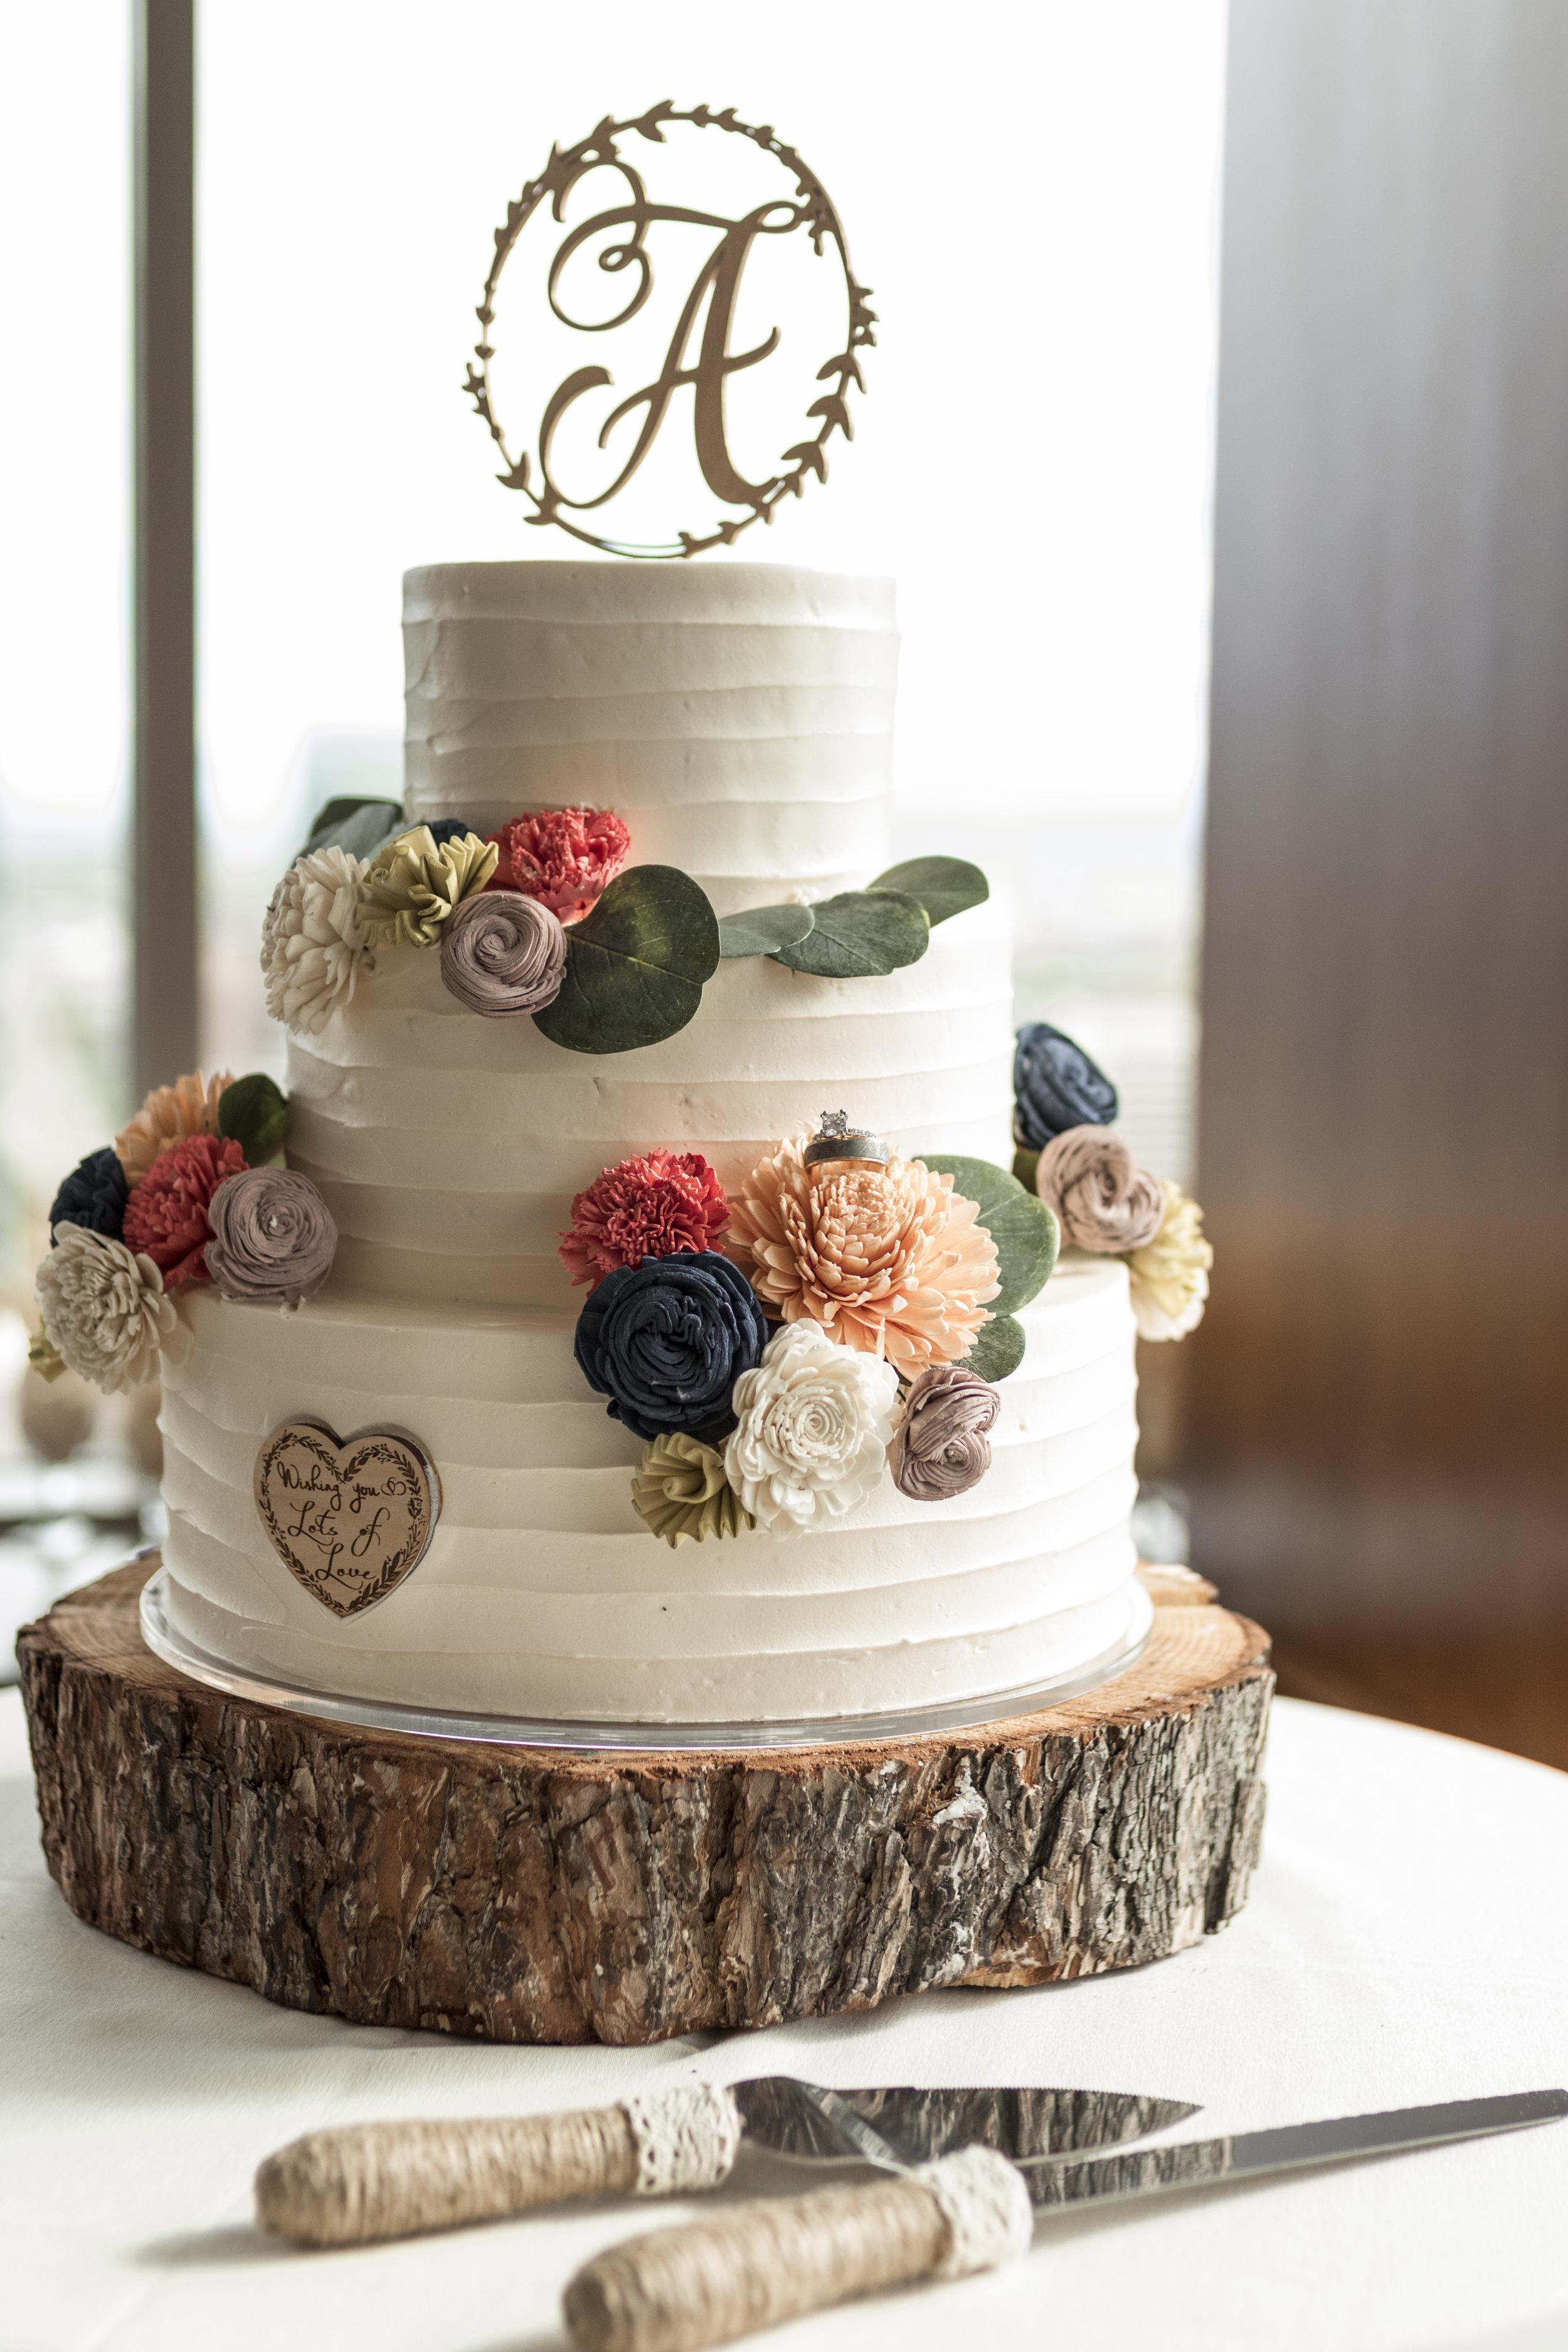 Utah Spring Wedding Reception in the Zions Bank Founders Room by Bri Bergman Photography05.JPG